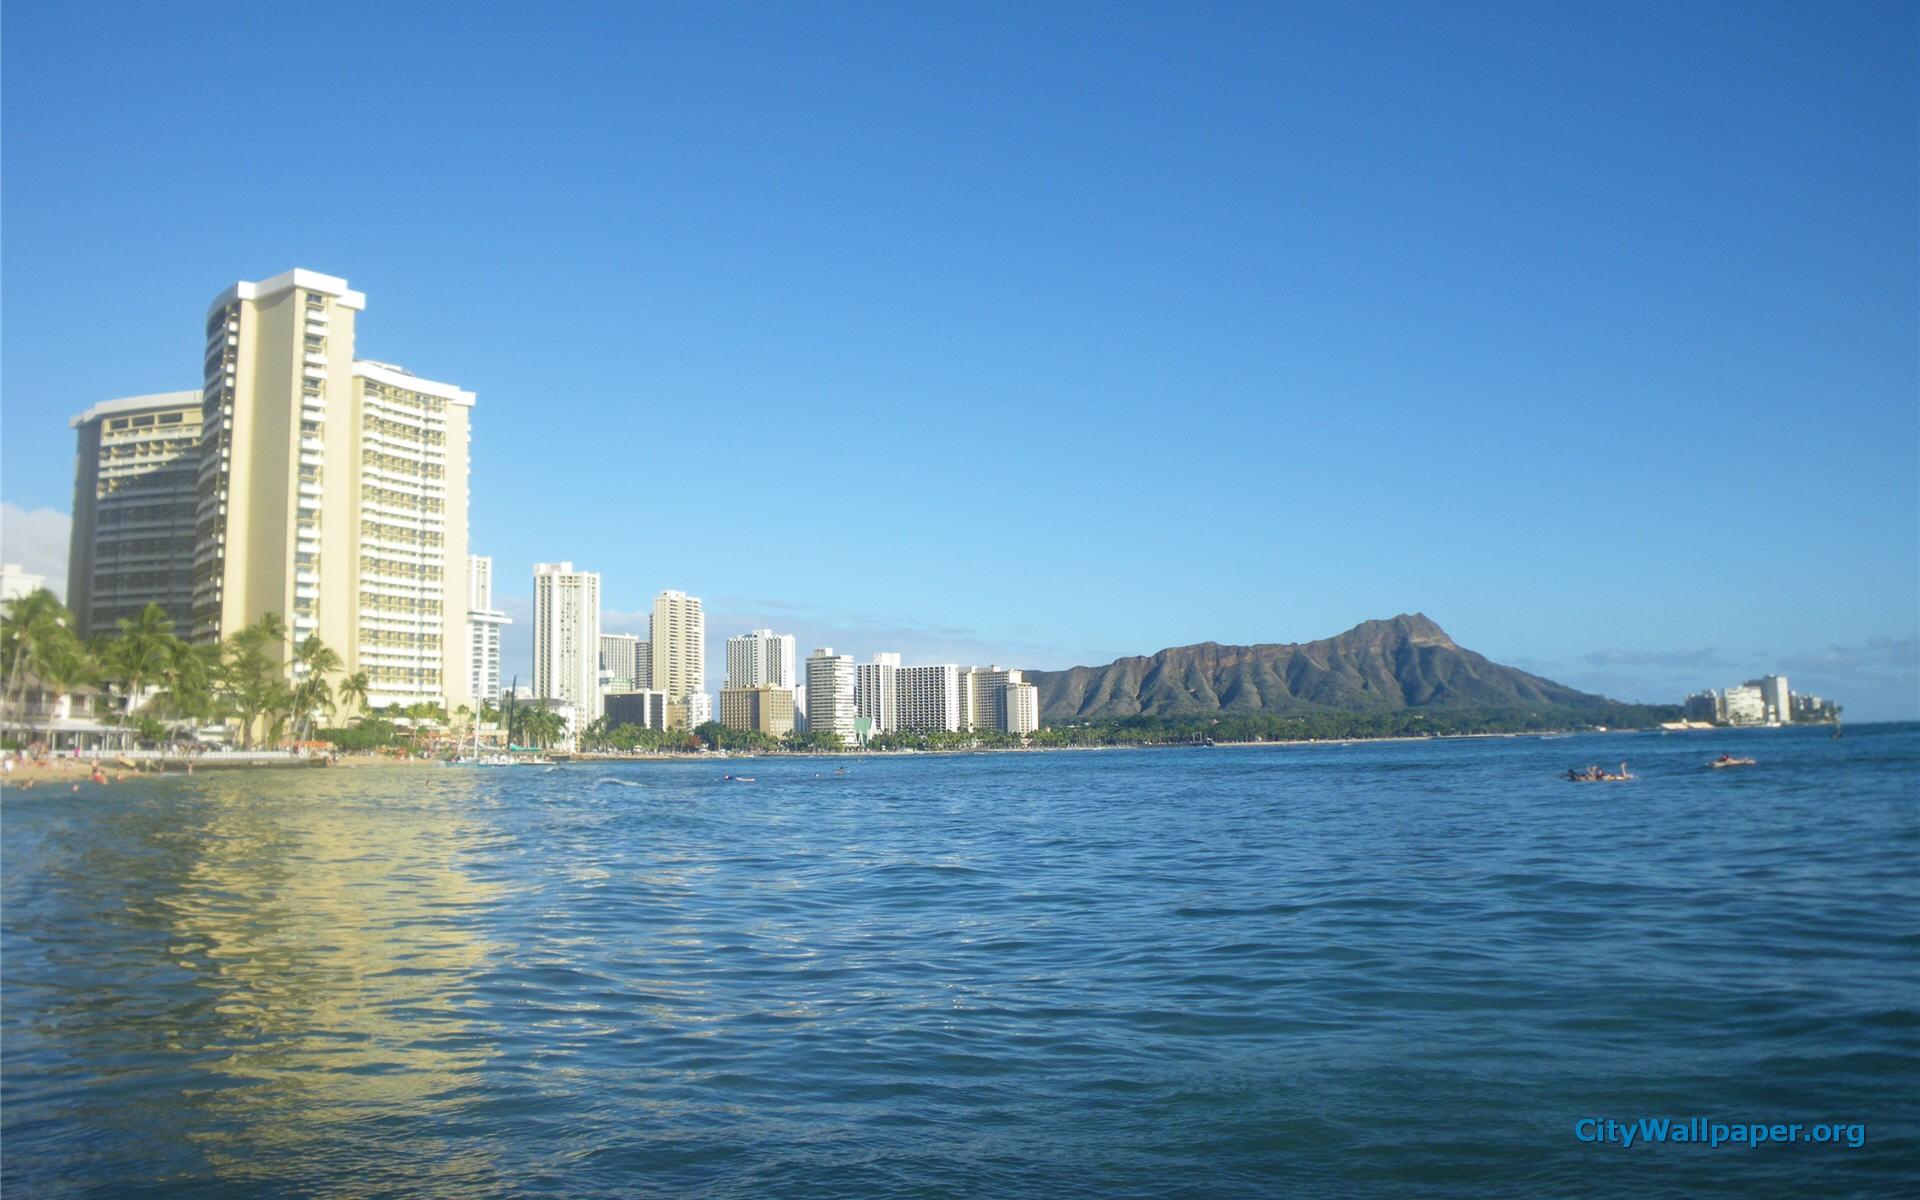 Waikiki Wallpaper: Honolulu Wallpapers Free